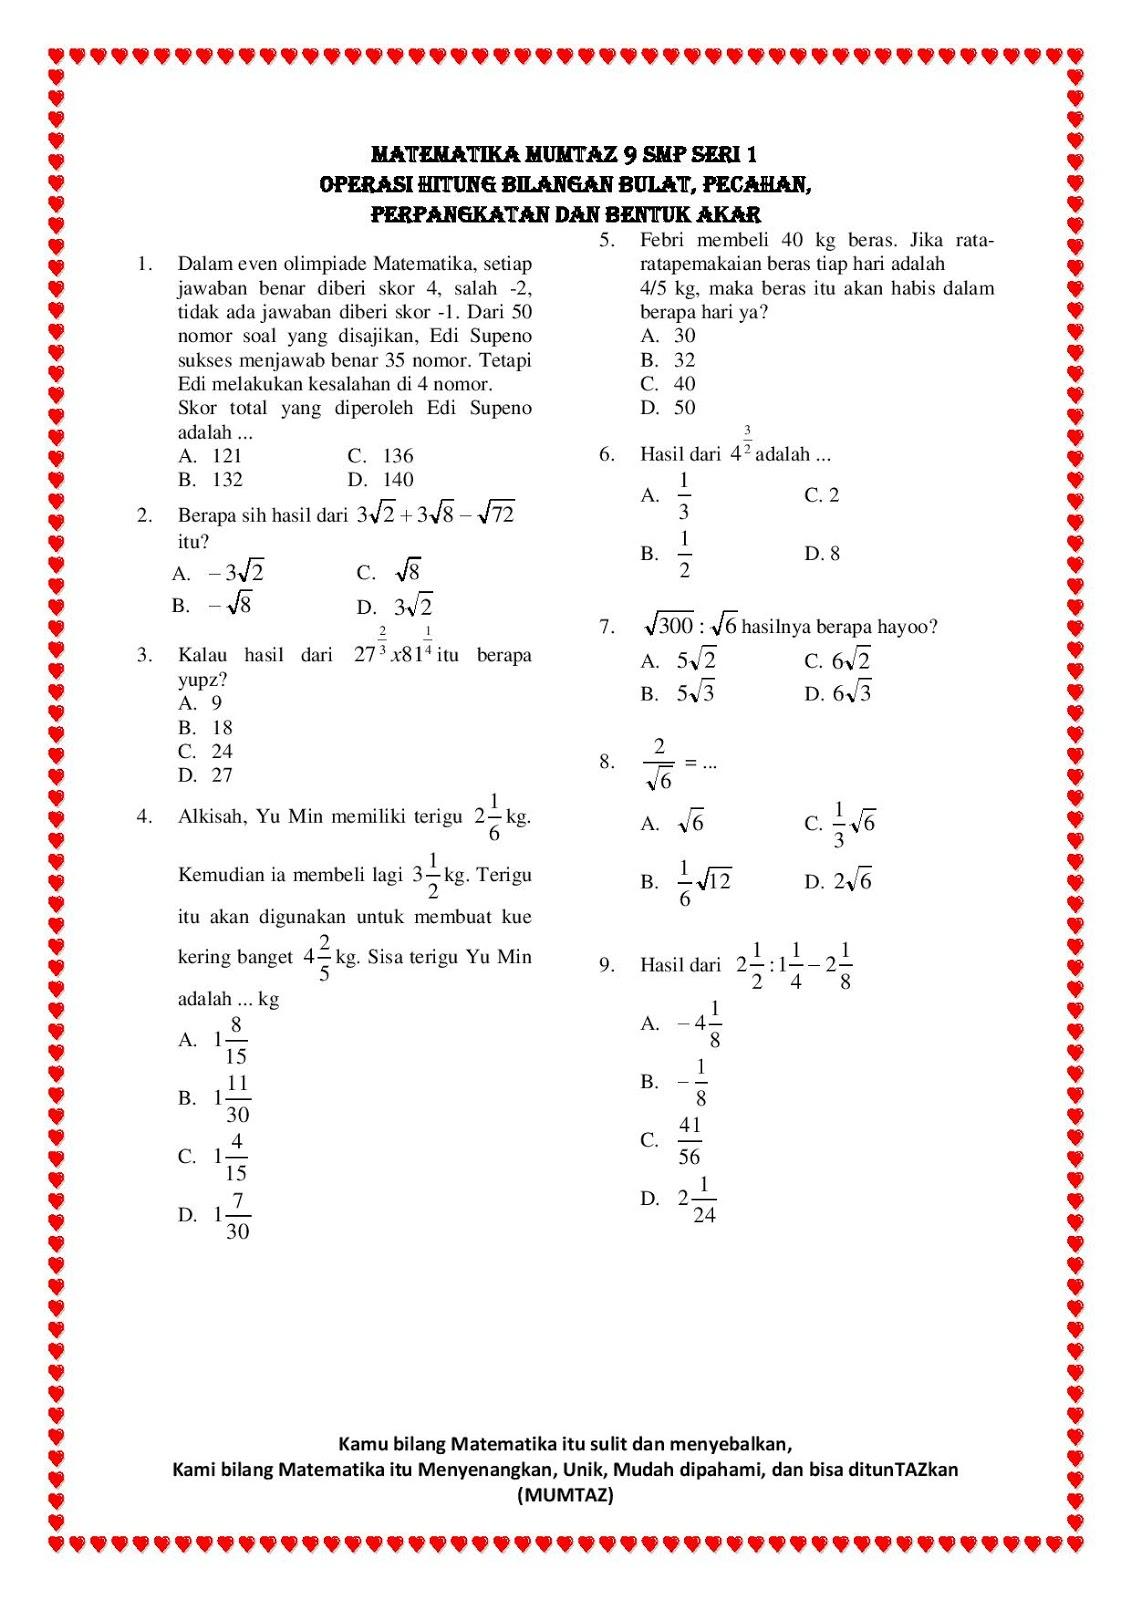 Contoh Soal Bilangan Bulat Dan Pecahan Kelas 7 Nada Blog